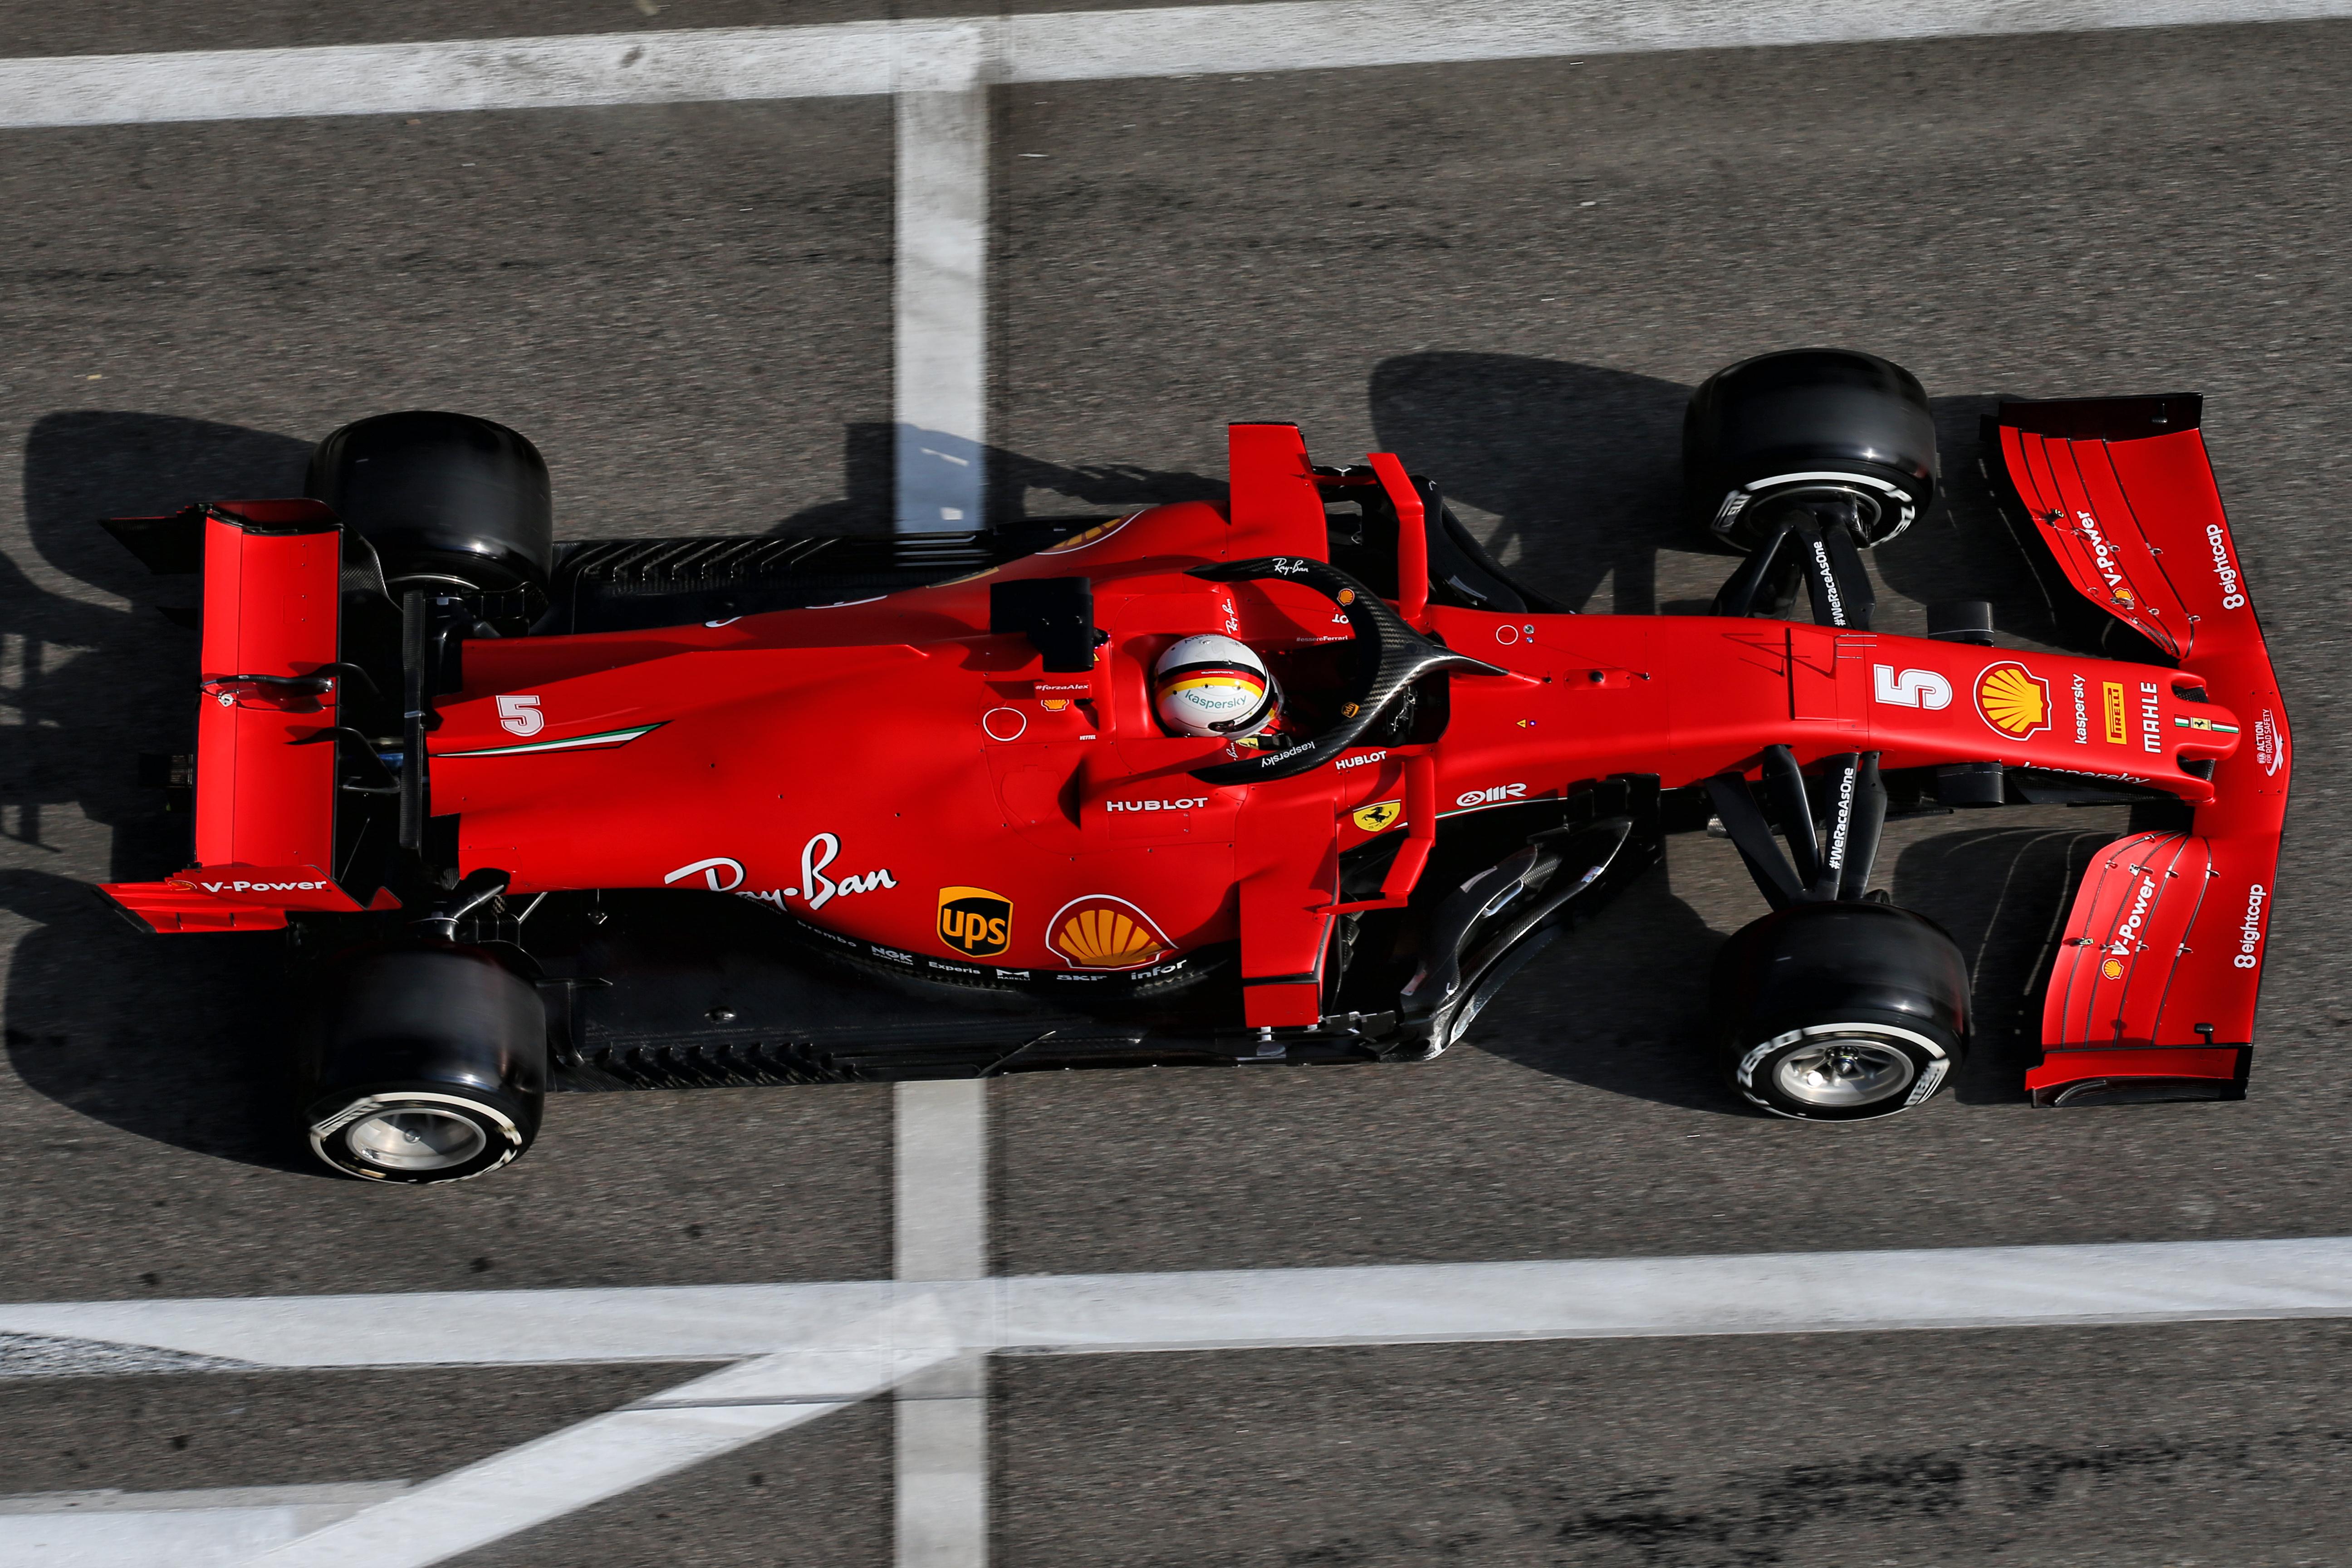 Motor Racing Formula One World Championship Russian Grand Prix Practice Day Sochi, Russia